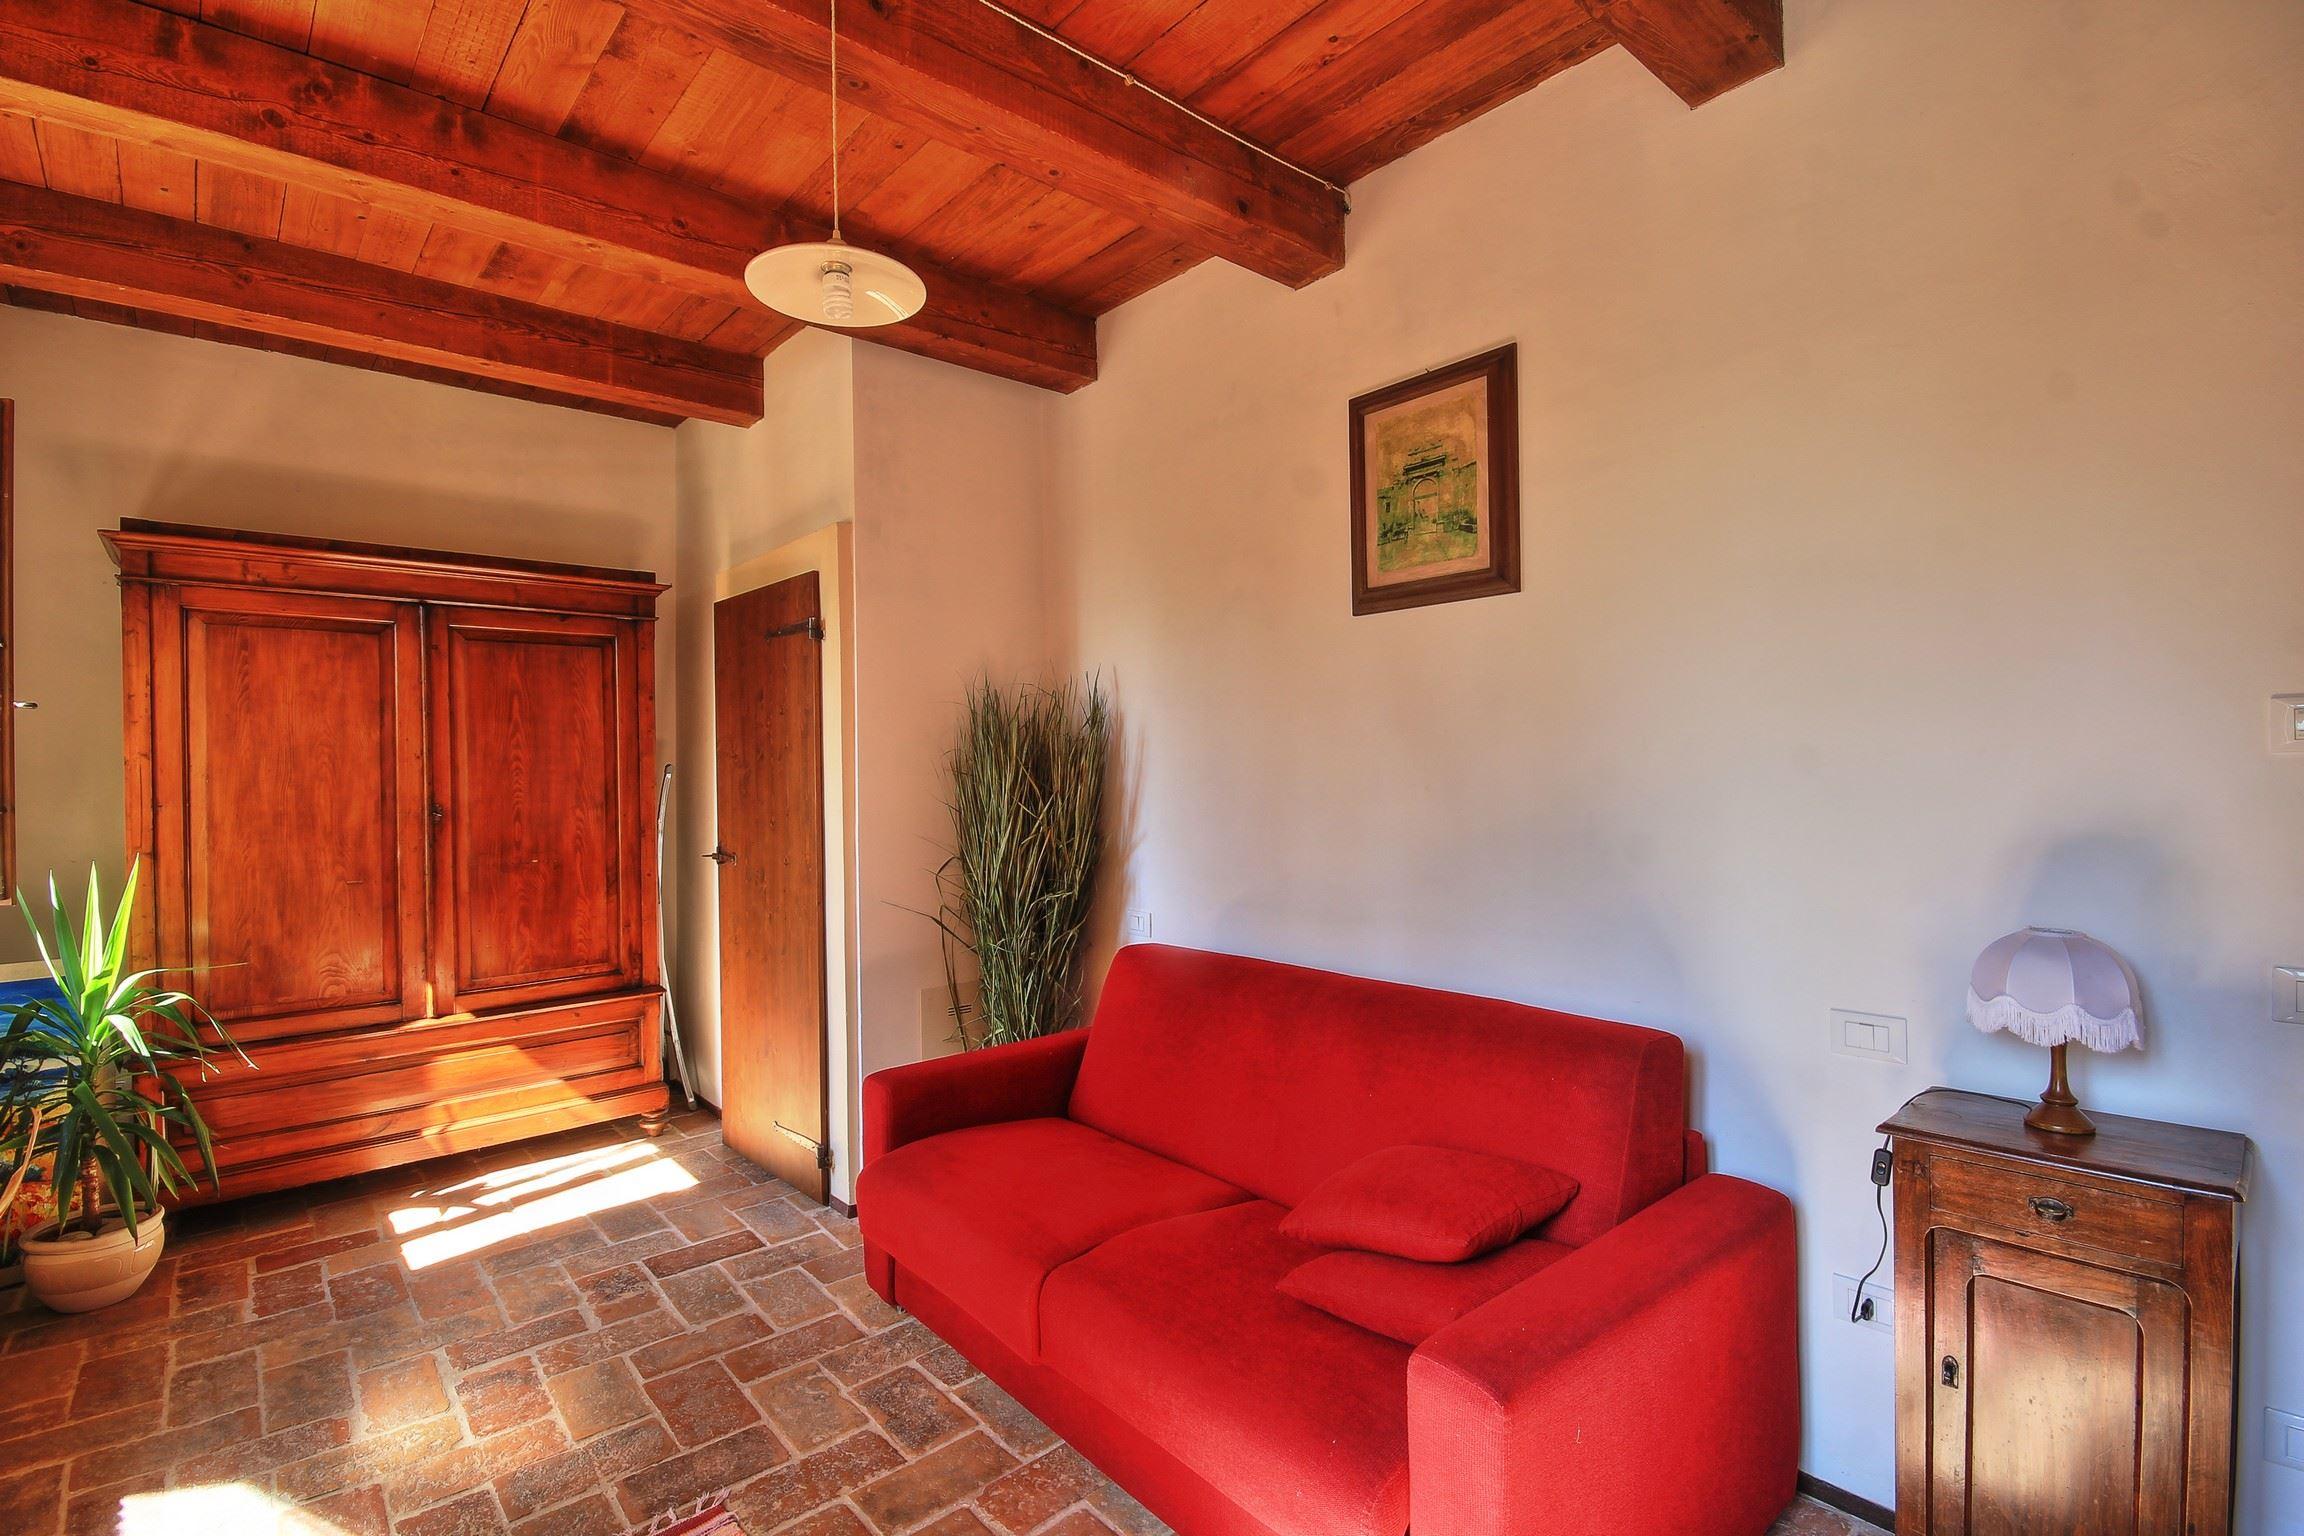 Ferienhaus VILLA DELLE VIGNE (2129909), Pesaro, Pesaro und Urbino, Marken, Italien, Bild 7